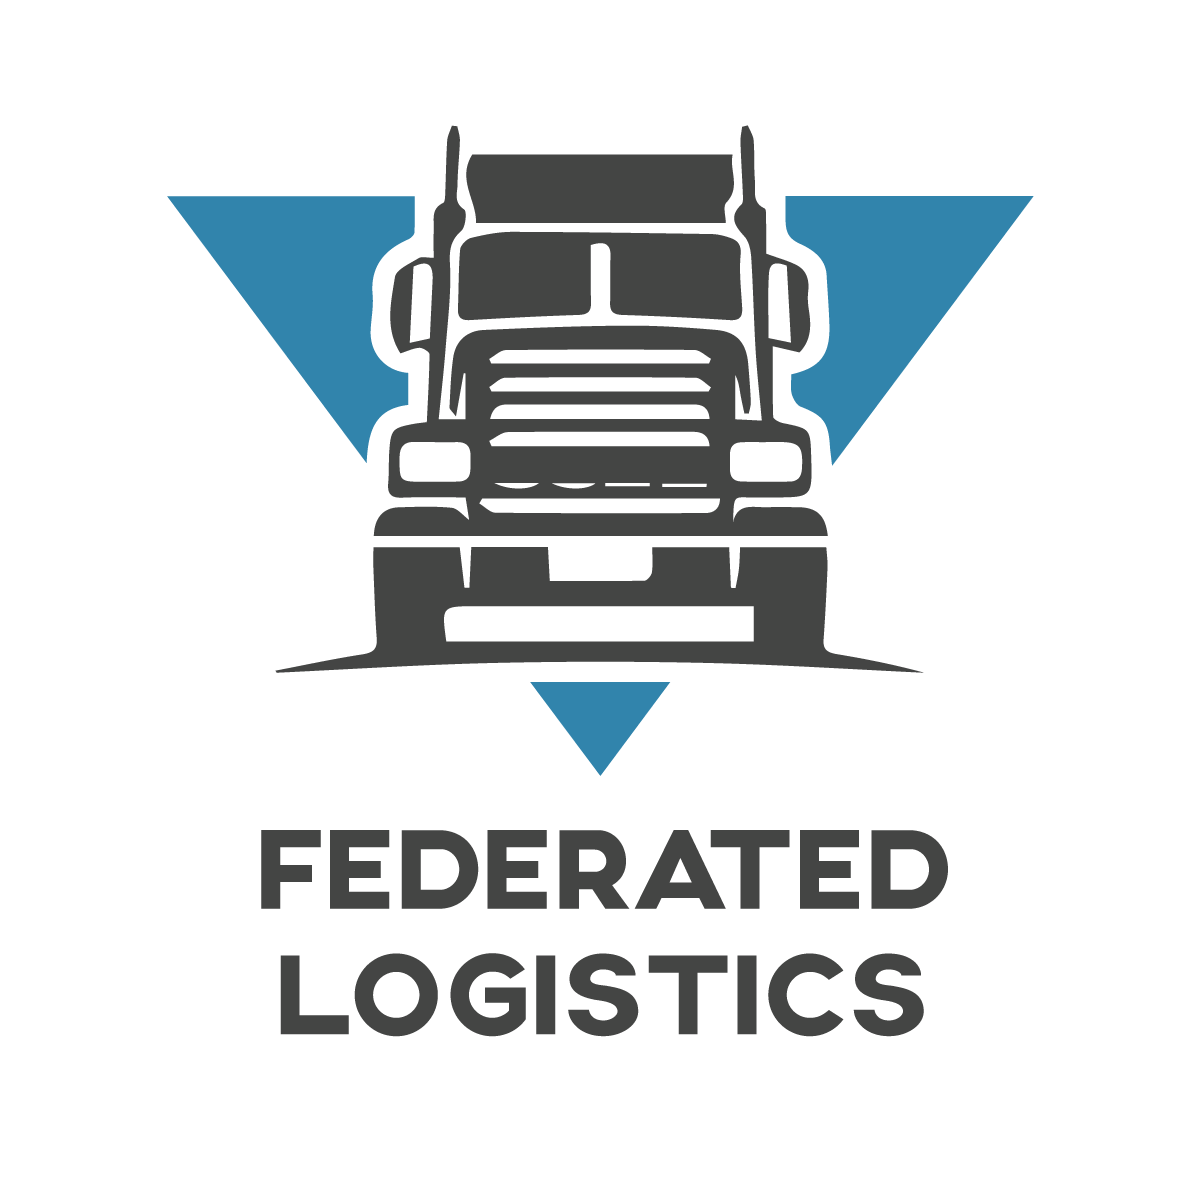 Federated Logistics_transparent